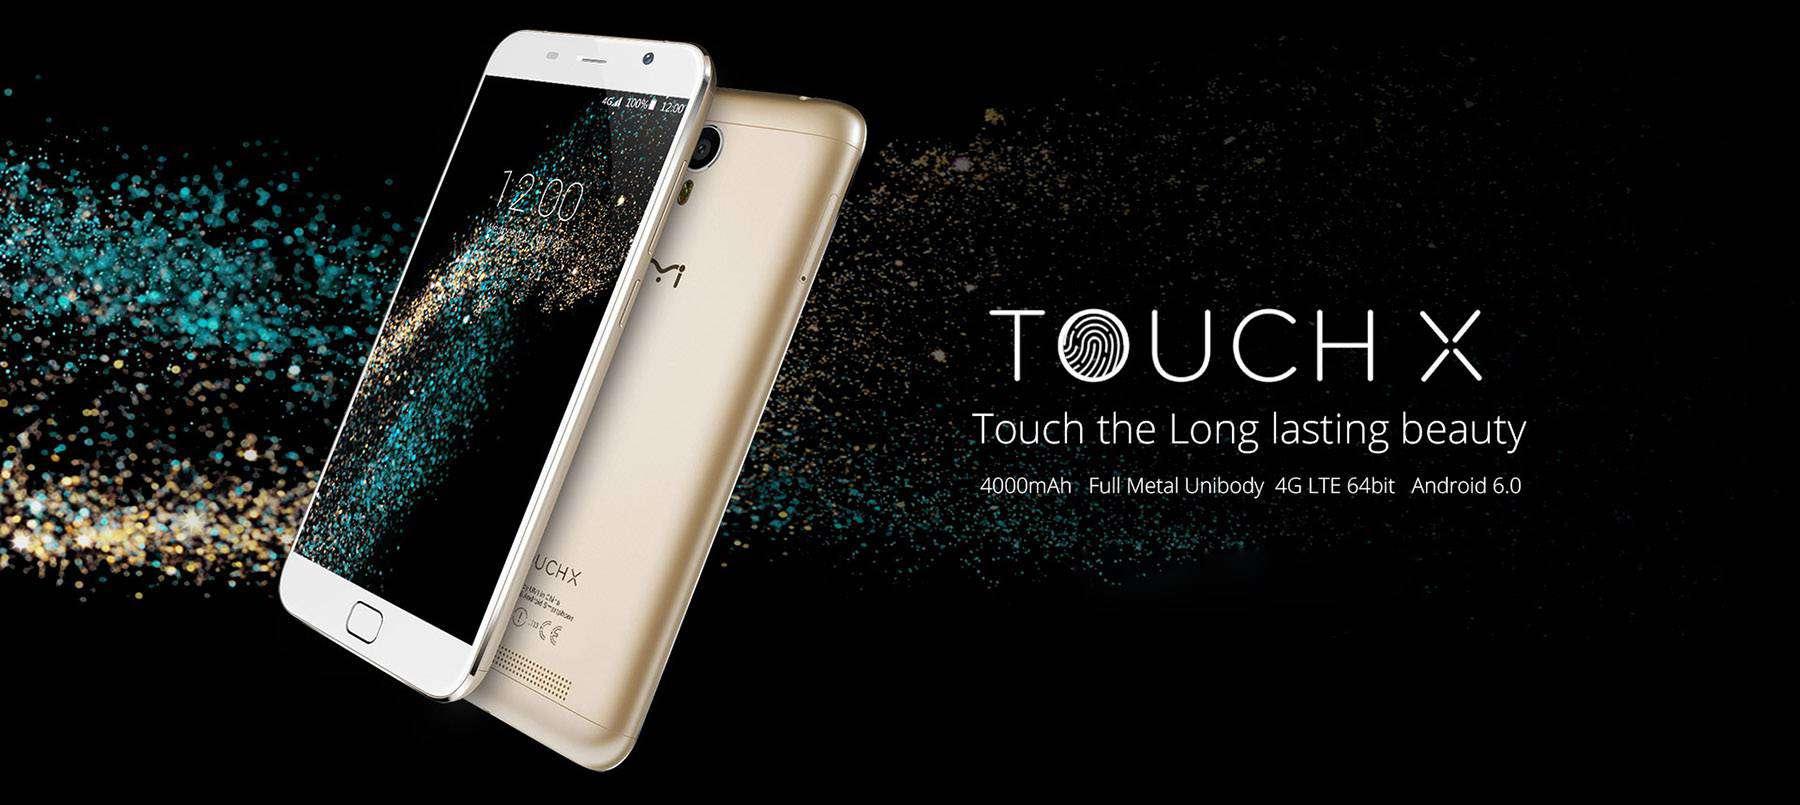 Umi Touch X GB 05